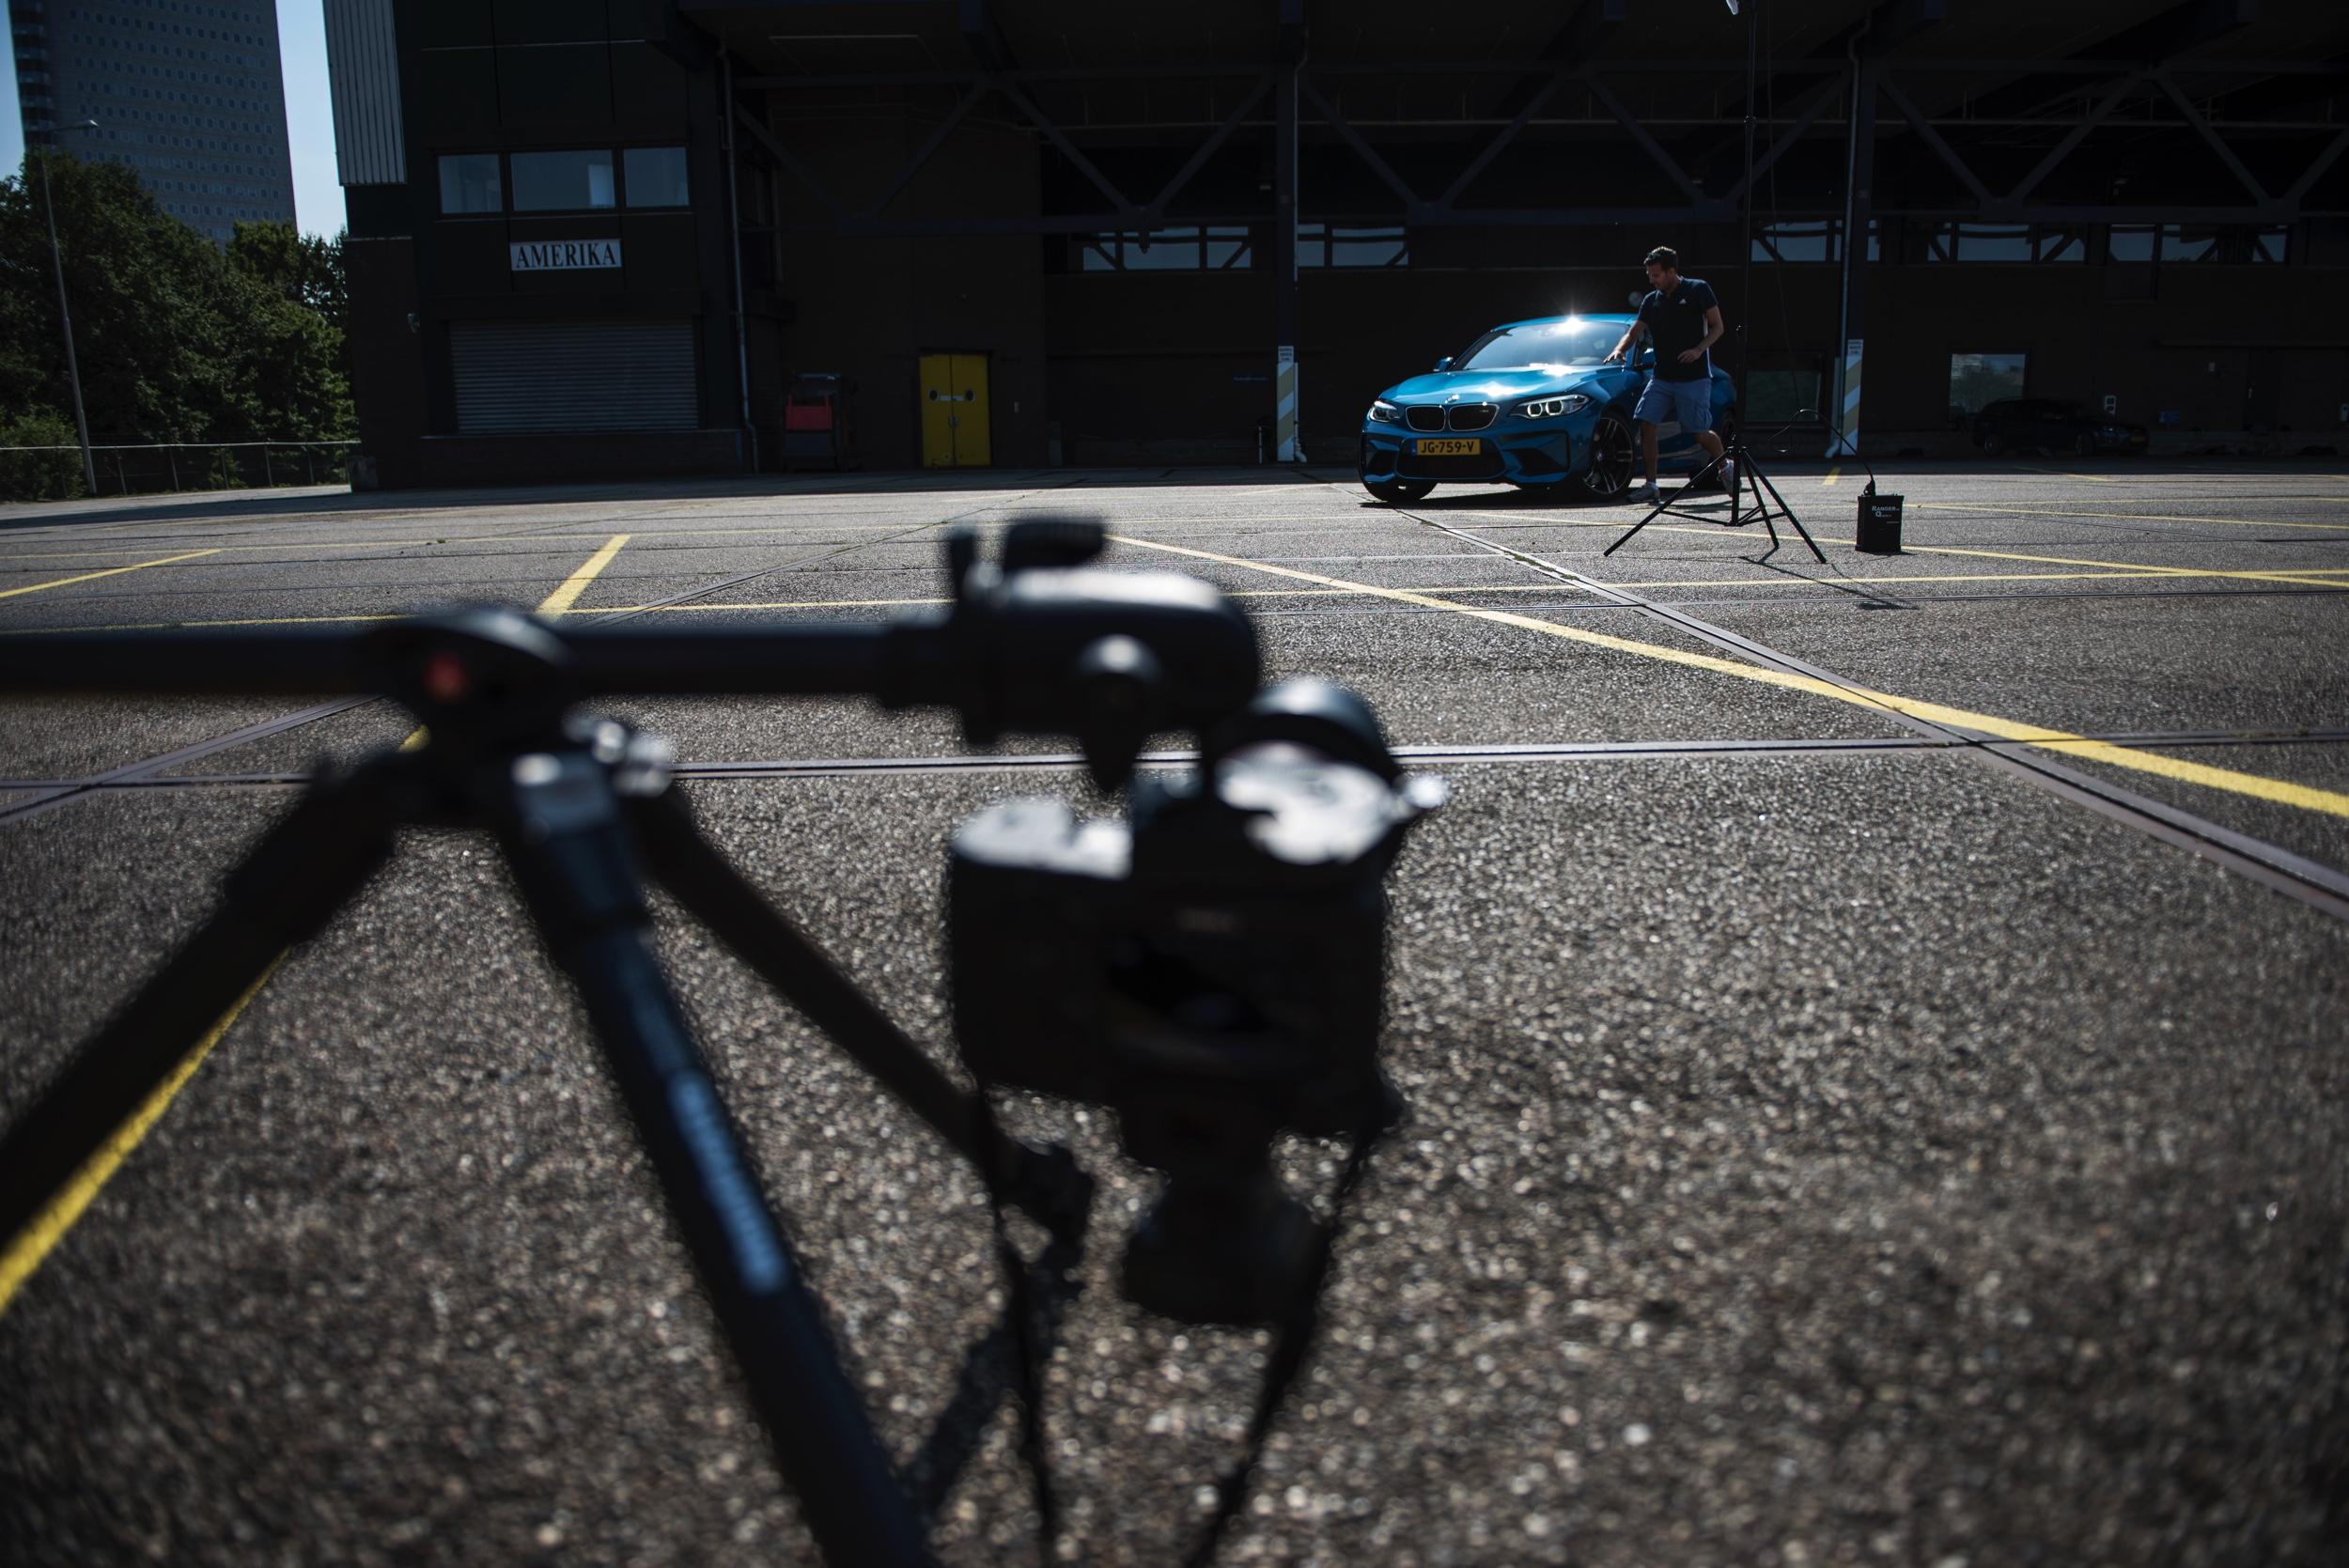 Fotografieworkshop - Sytse Dijkstra - Autovisie.nl -7